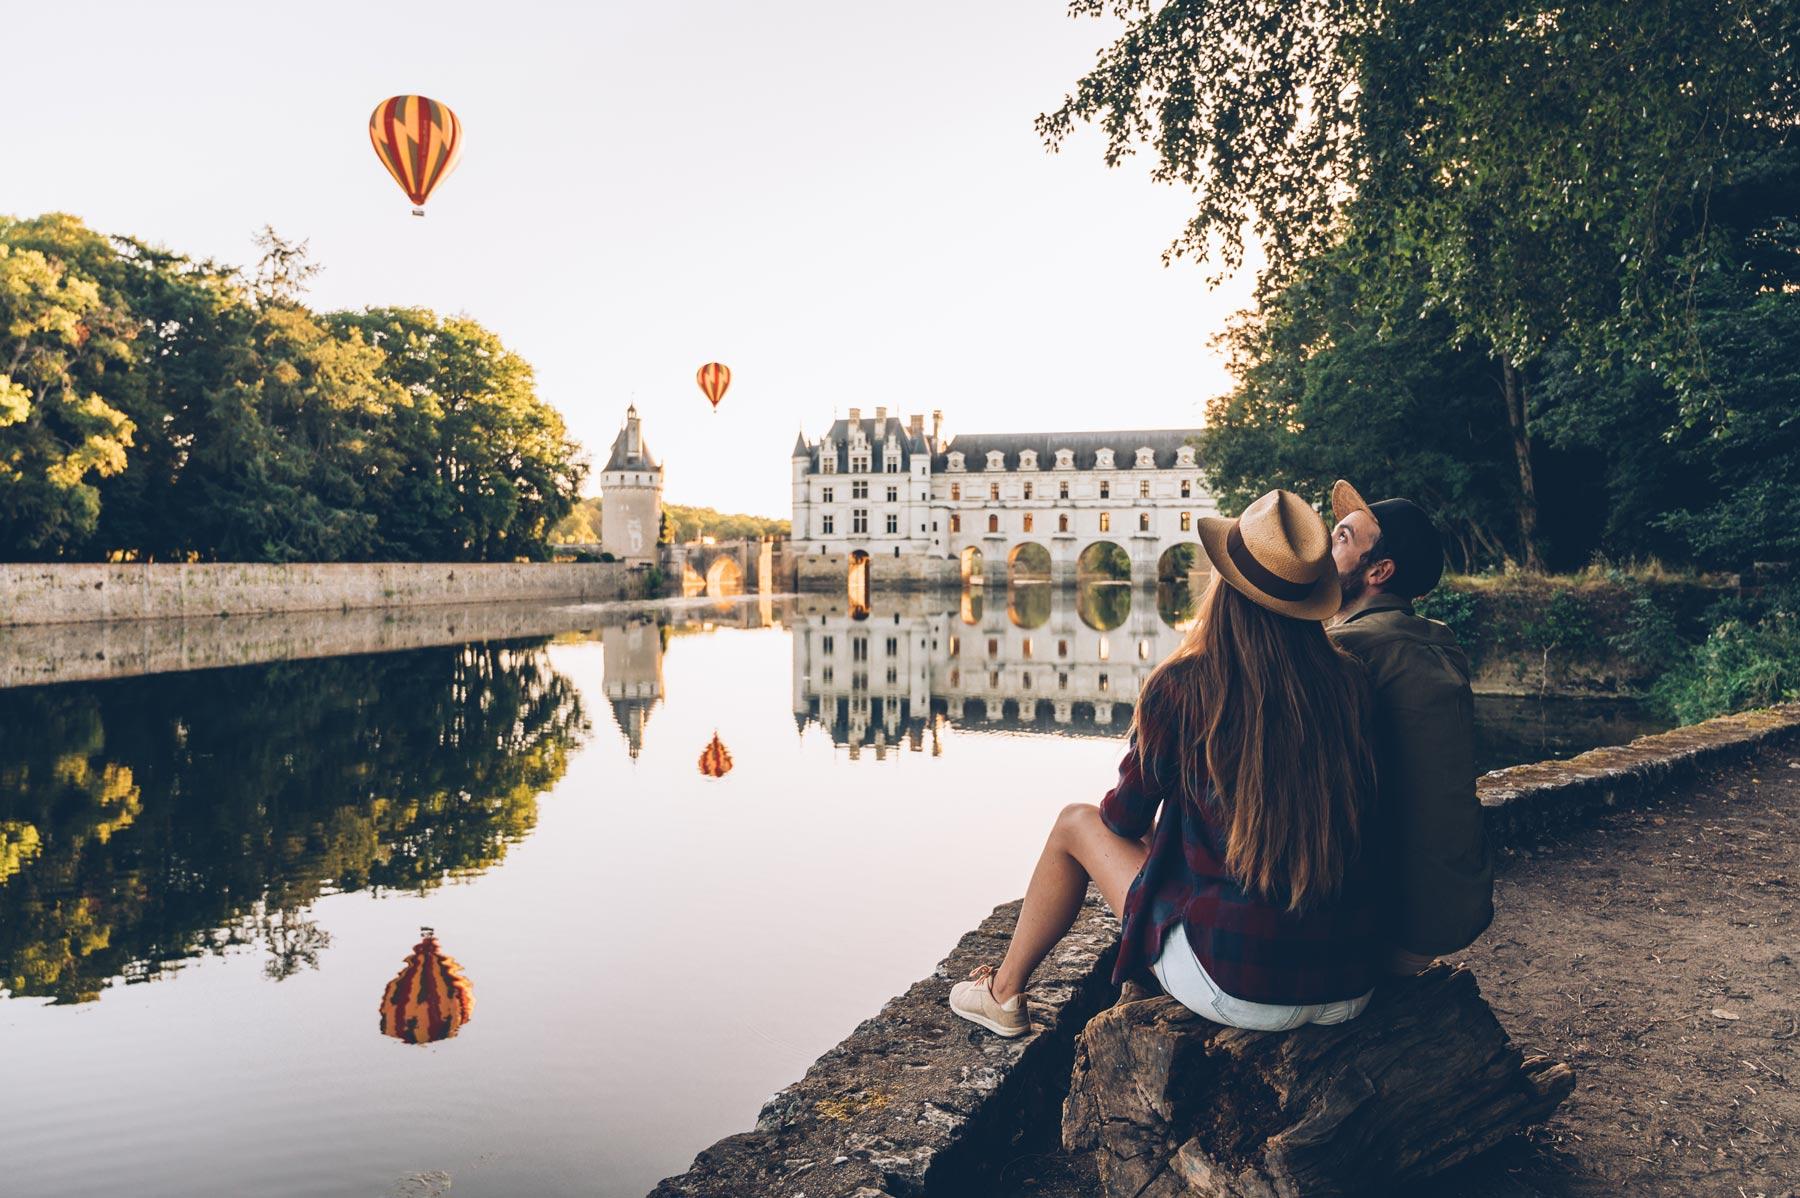 Chenonceau, le plus beau chateau?